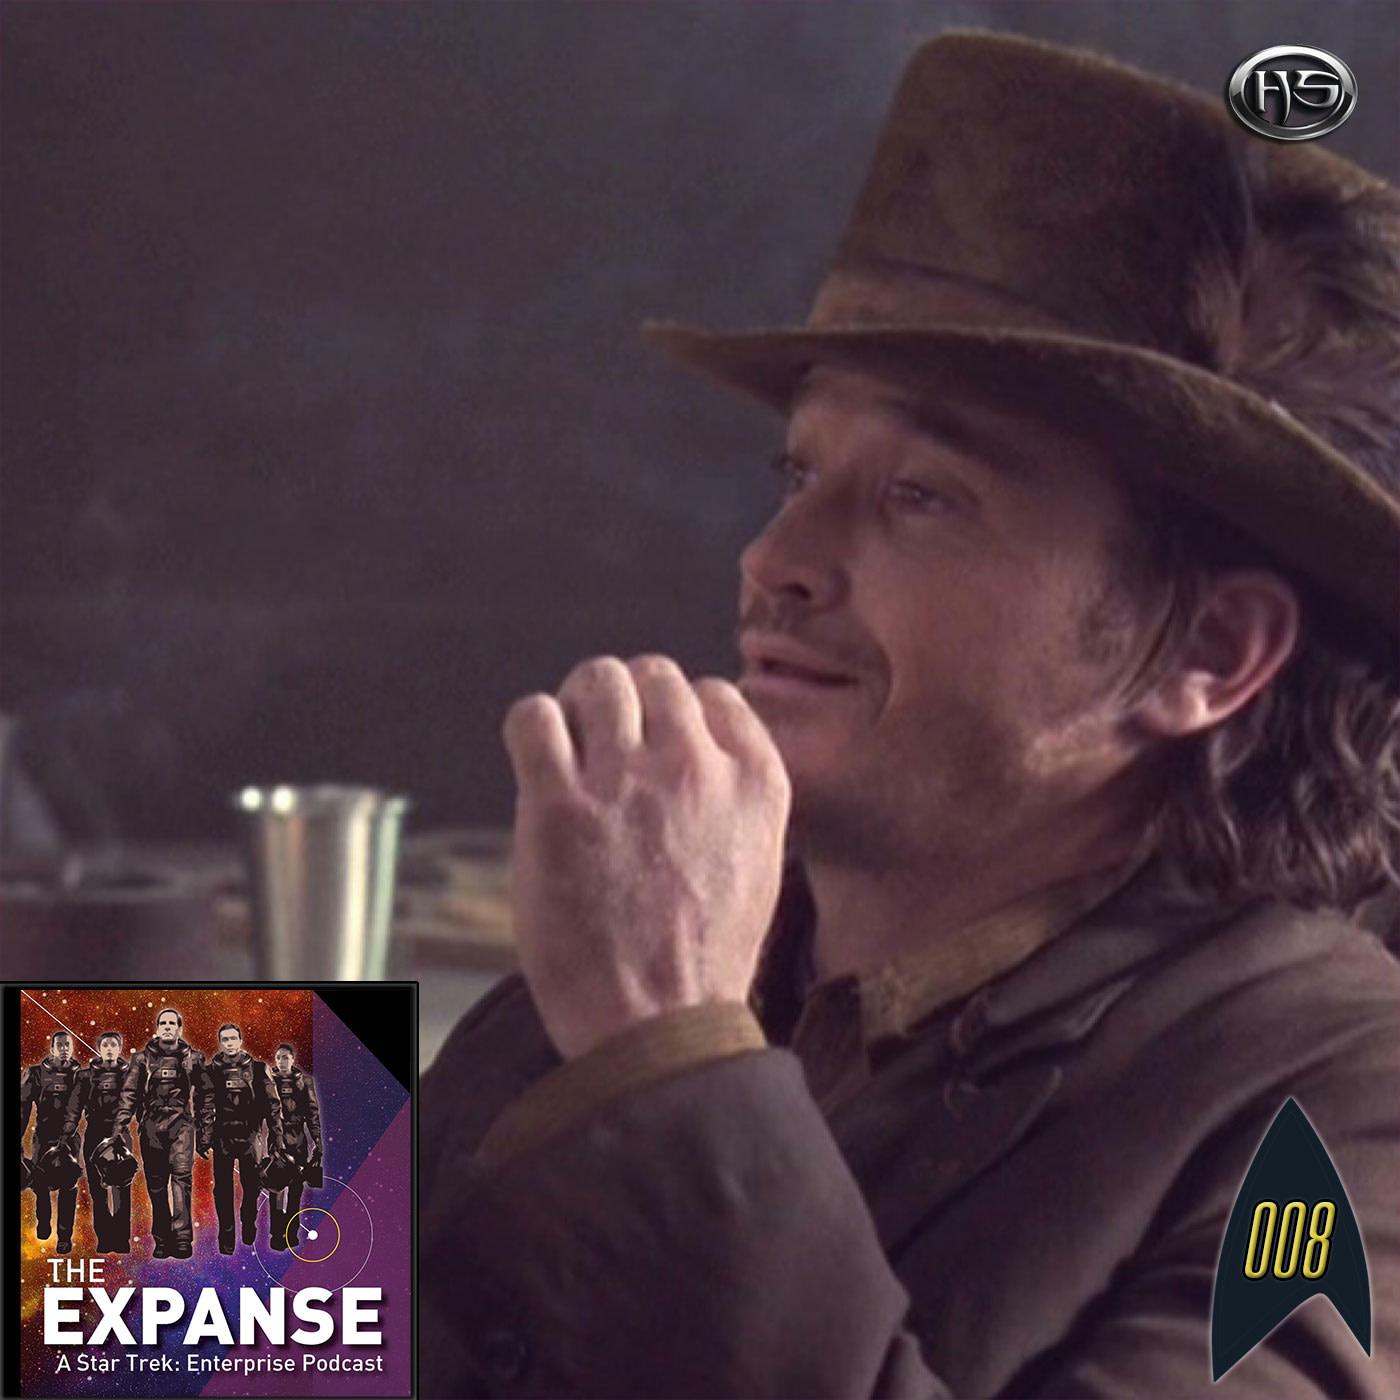 The Expanse Episode 8